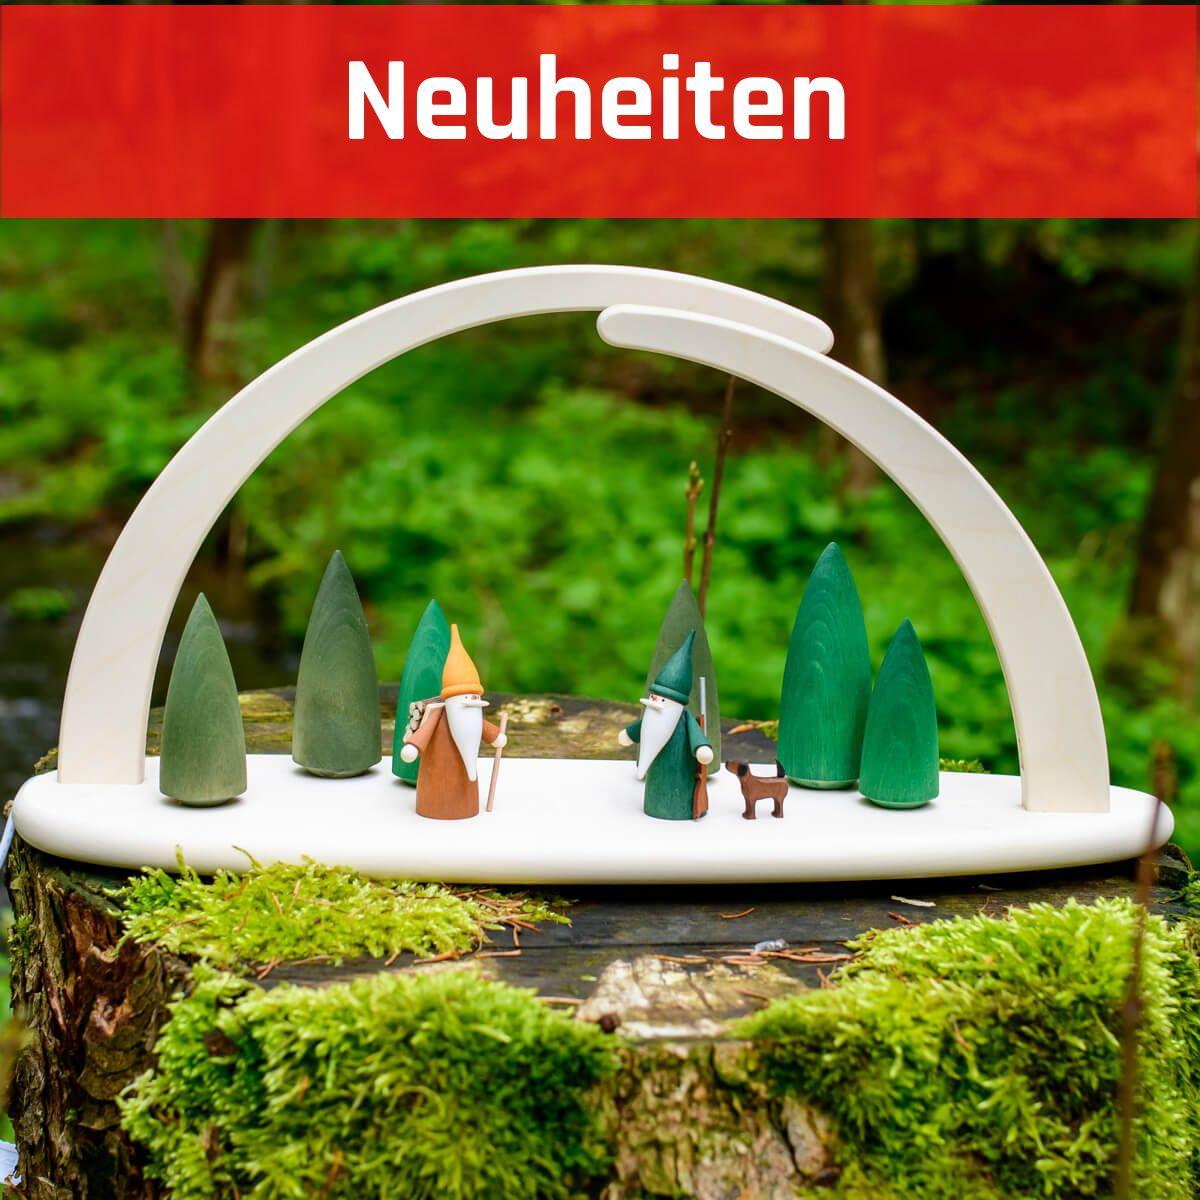 LED Lichterbogen aus Holz 21 cm mit USB inkl. Netzstecker Waldszene